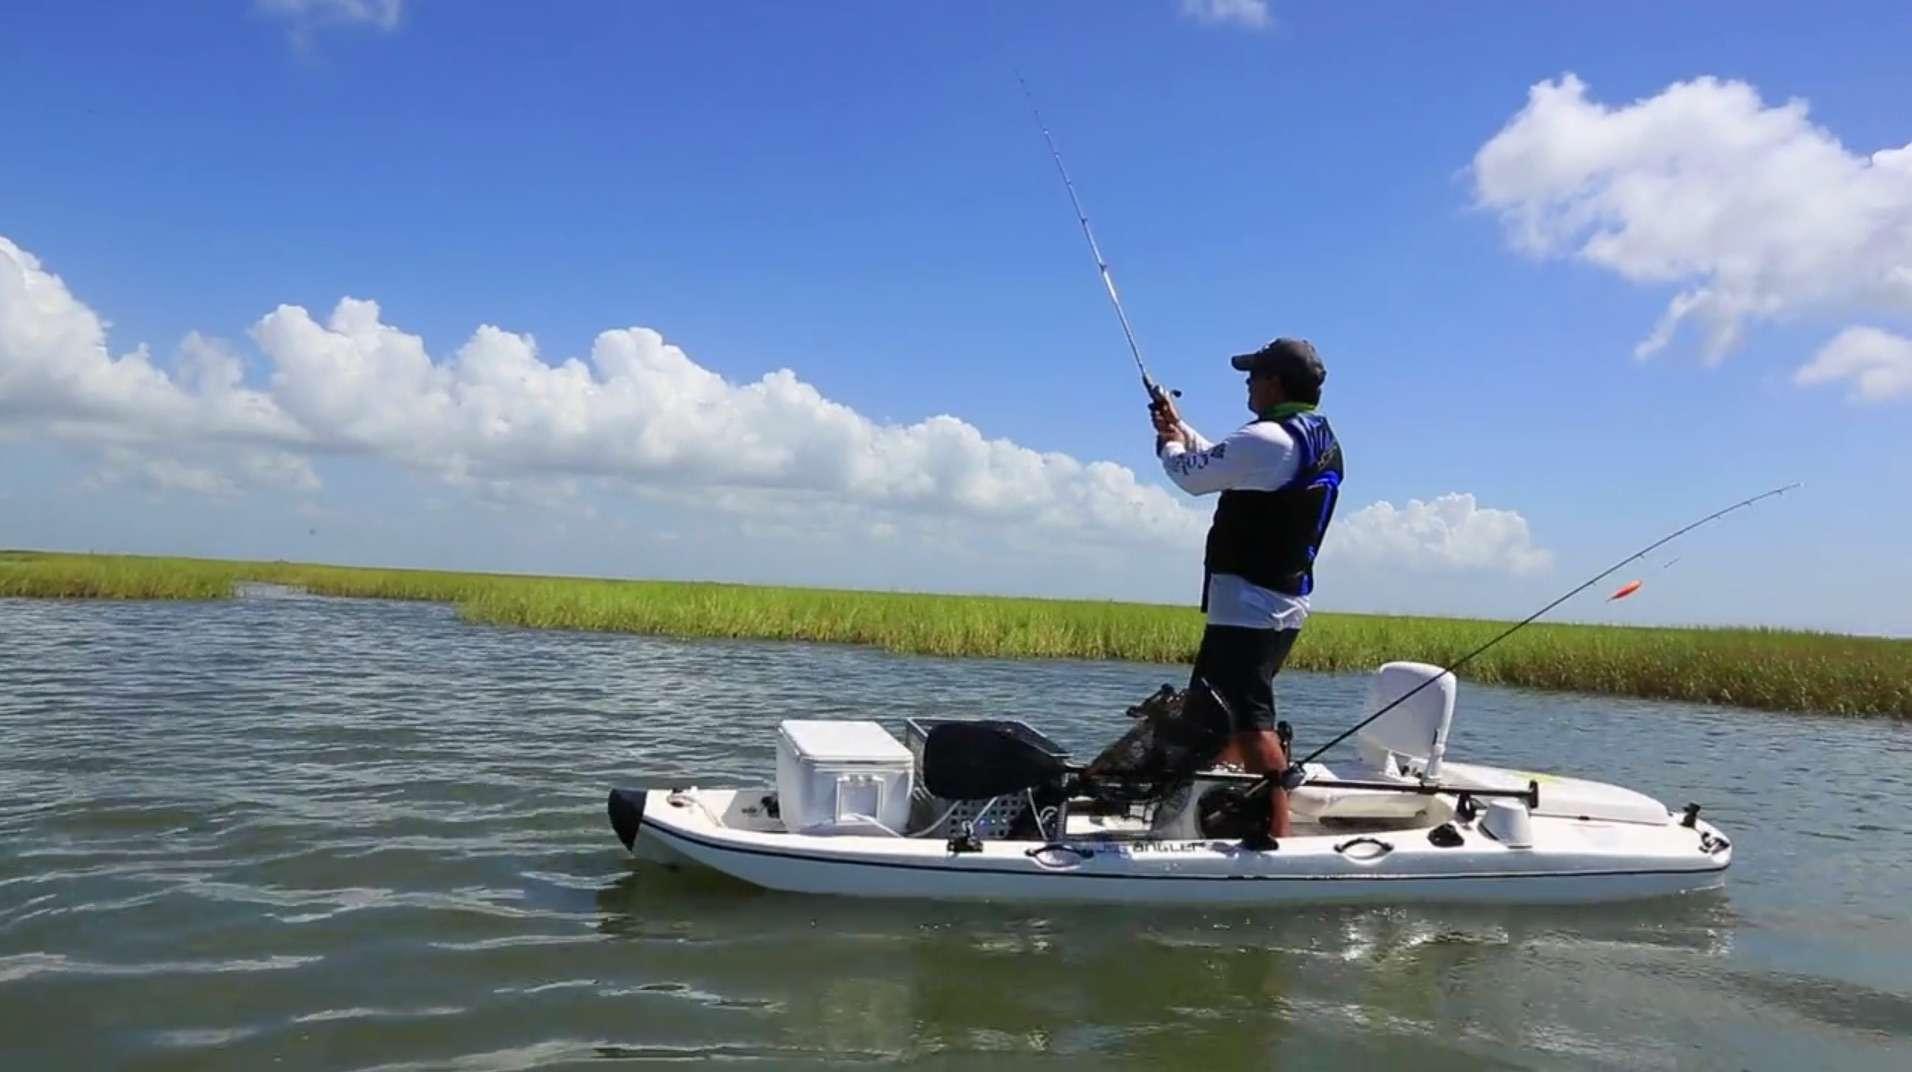 Jet Angler Jet Propelled Kayak Fishing